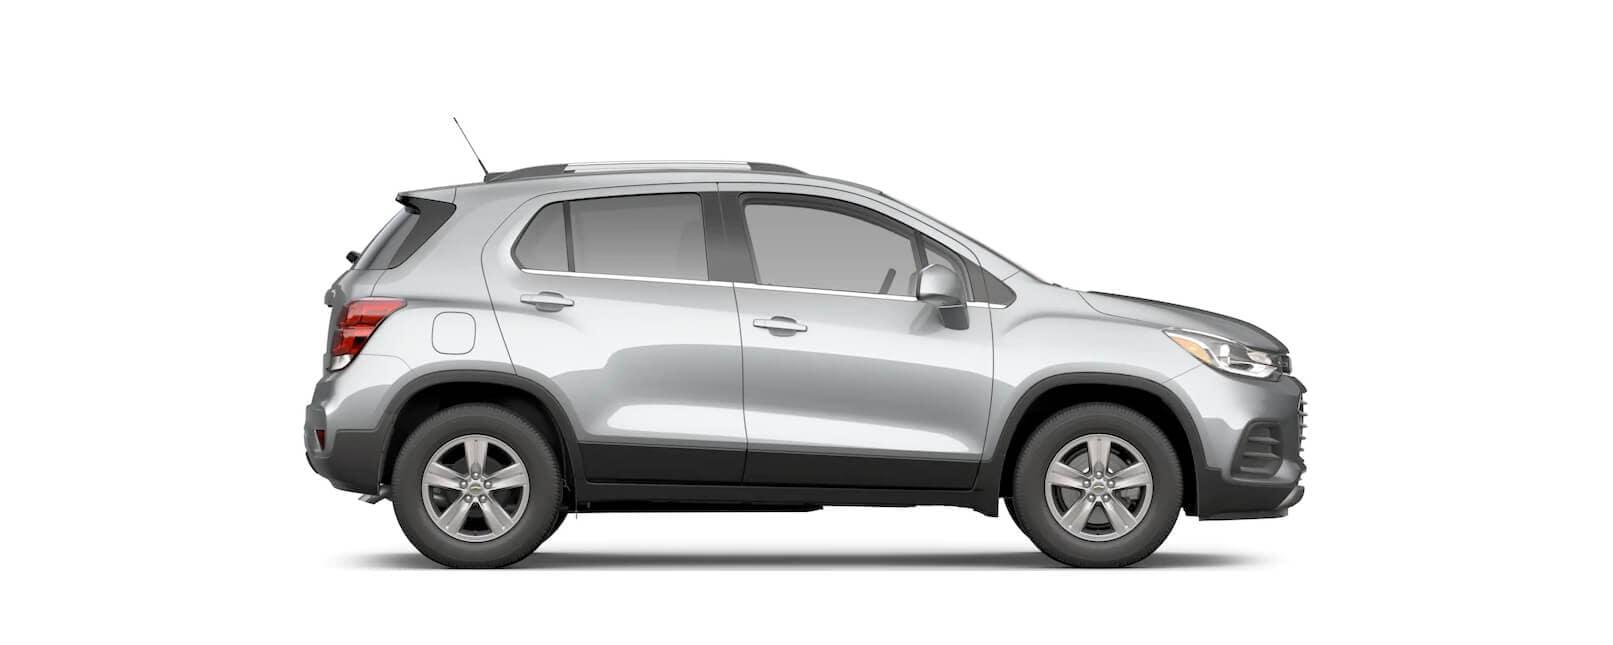 New Chevrolet Vehicles 2022 Trax